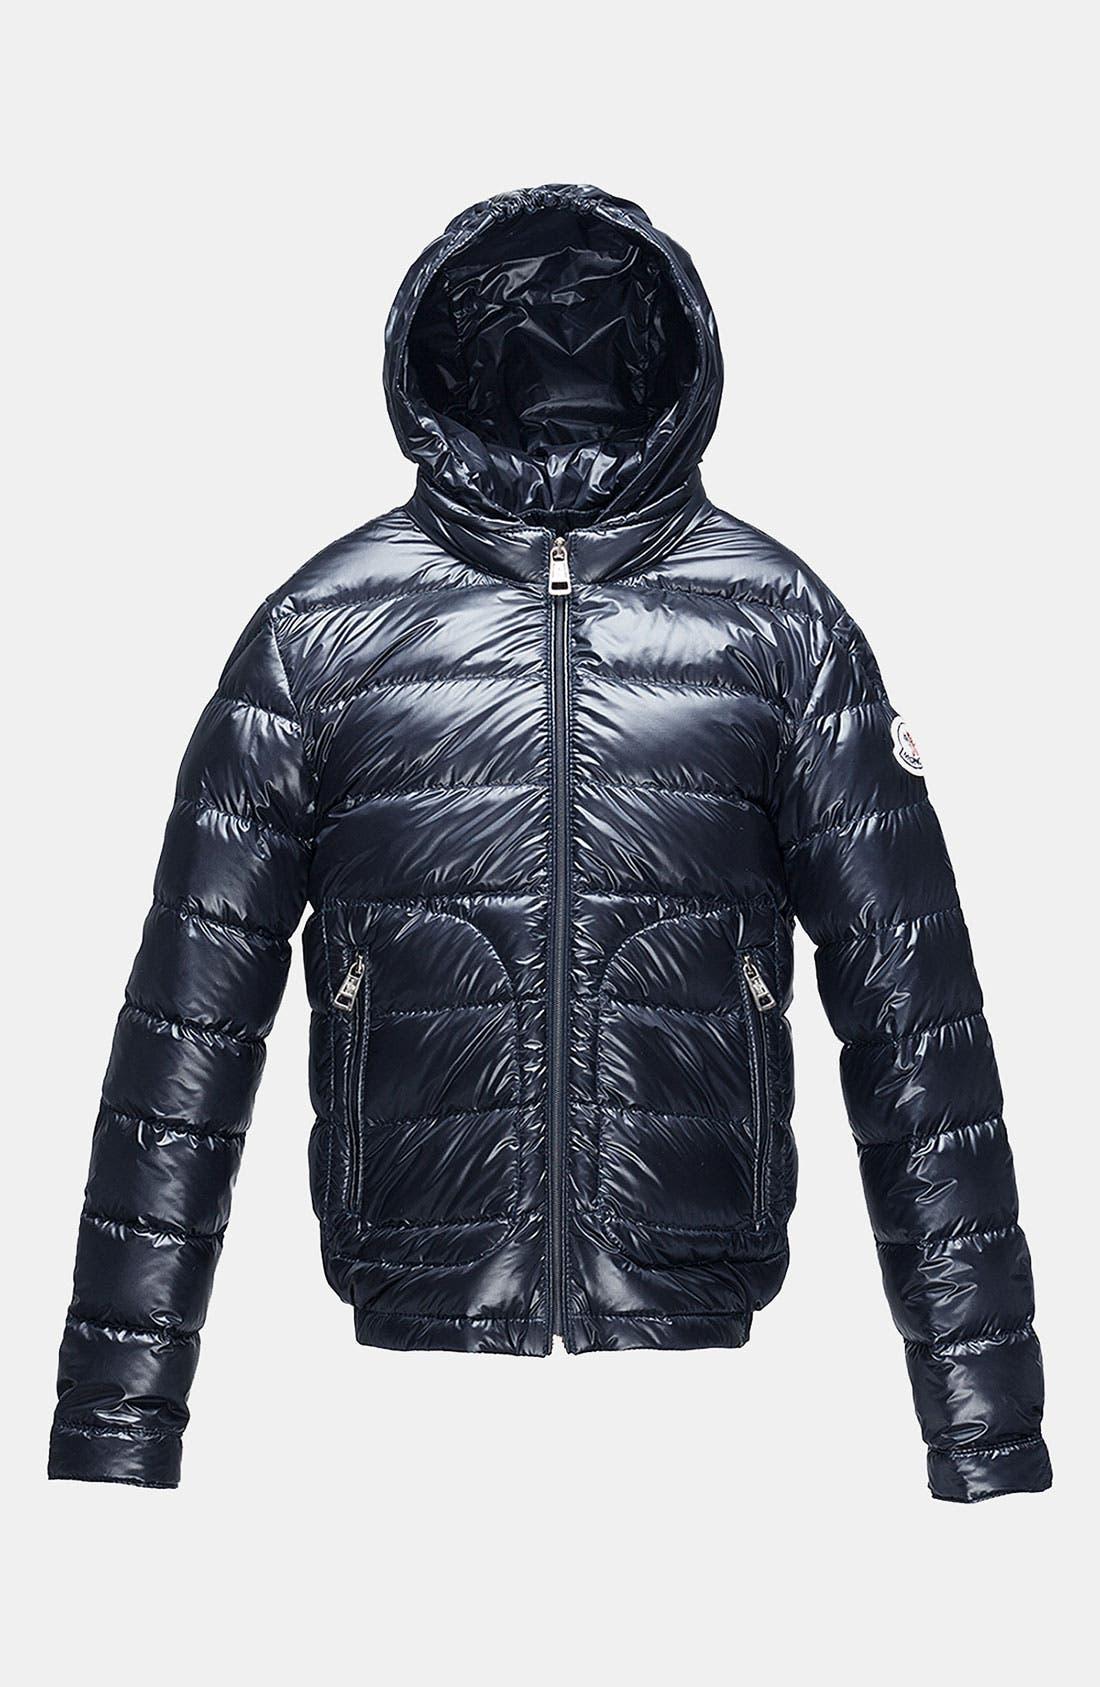 Alternate Image 1 Selected - Moncler Hooded Down Jacket (Little Boys & Big Boys)